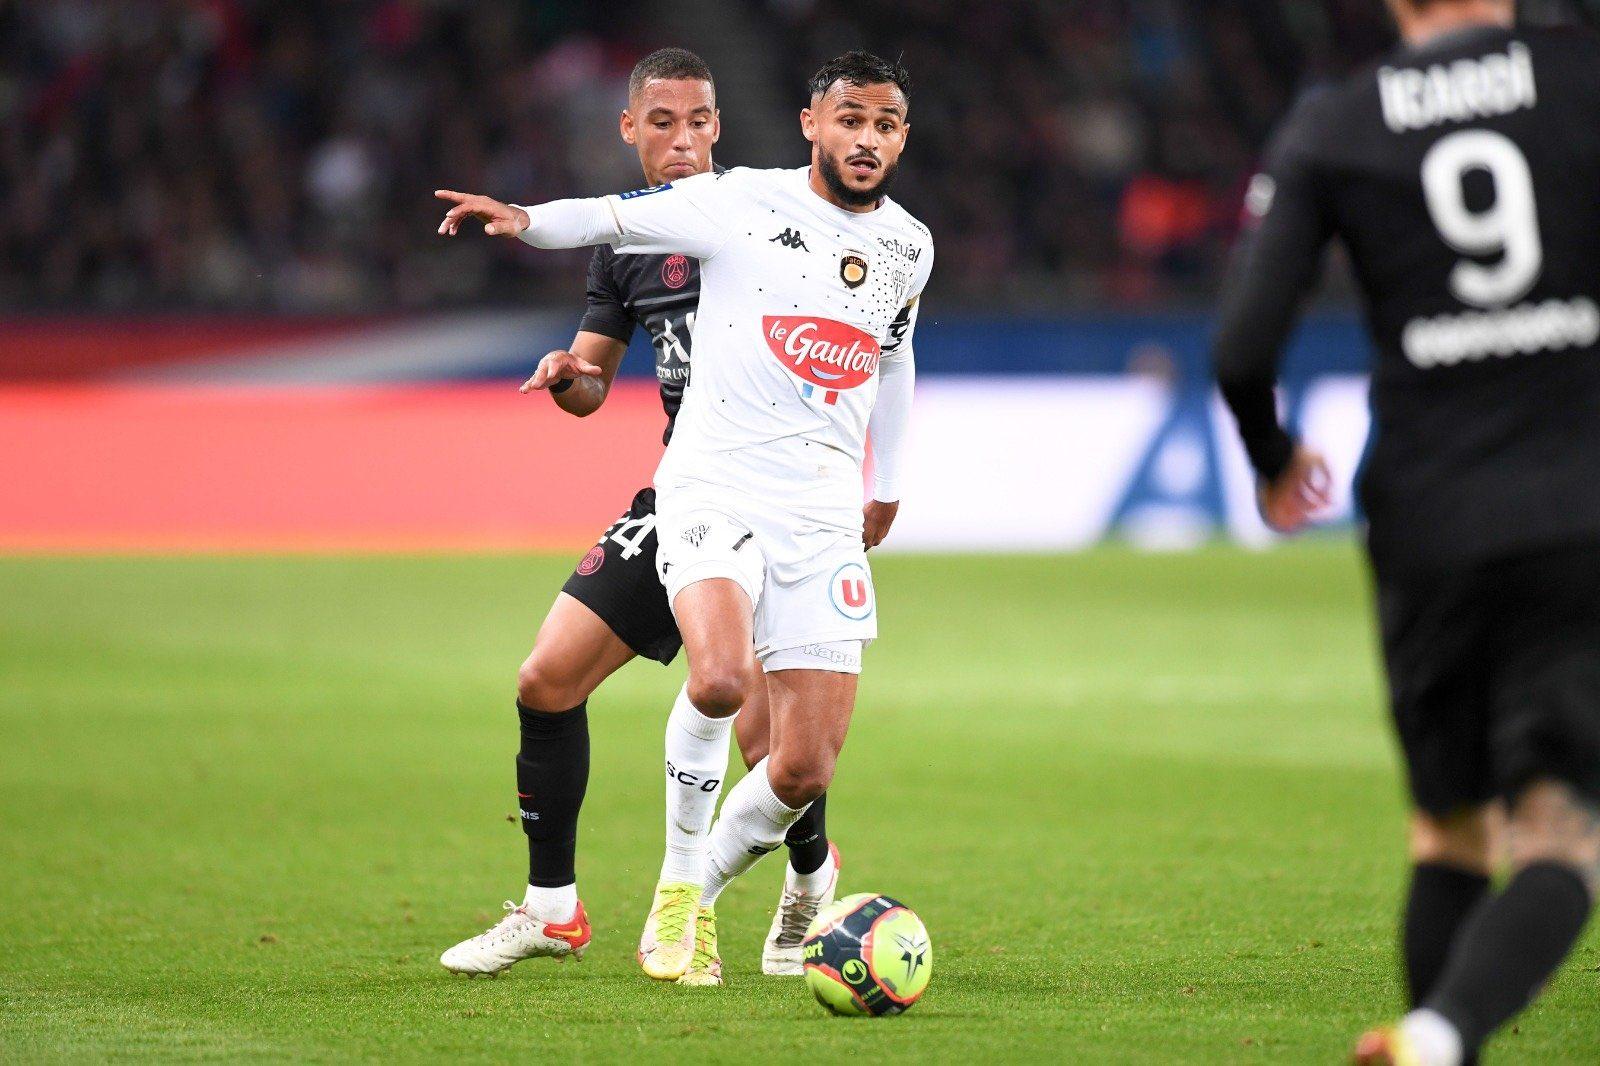 أسيست سفيان بوفال, سفيان بوفال, هدف بوفال, Sofiane Boufal, assist Sofiane Boufal, but boufal, goal boufal, Angelo Fulgini